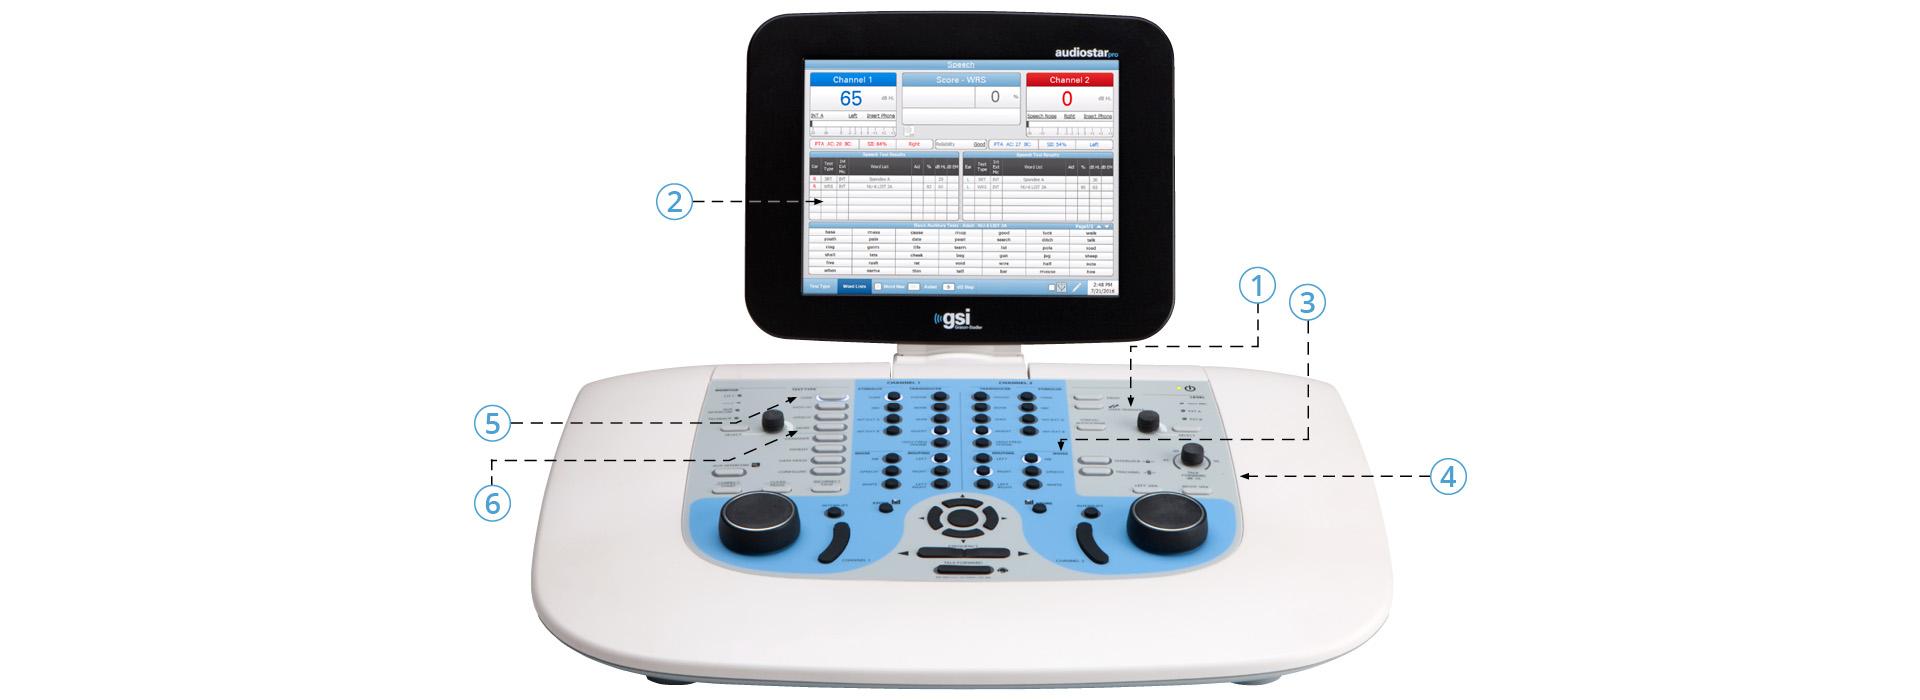 GSI AudioStar Pro Clincal Audiometer Features